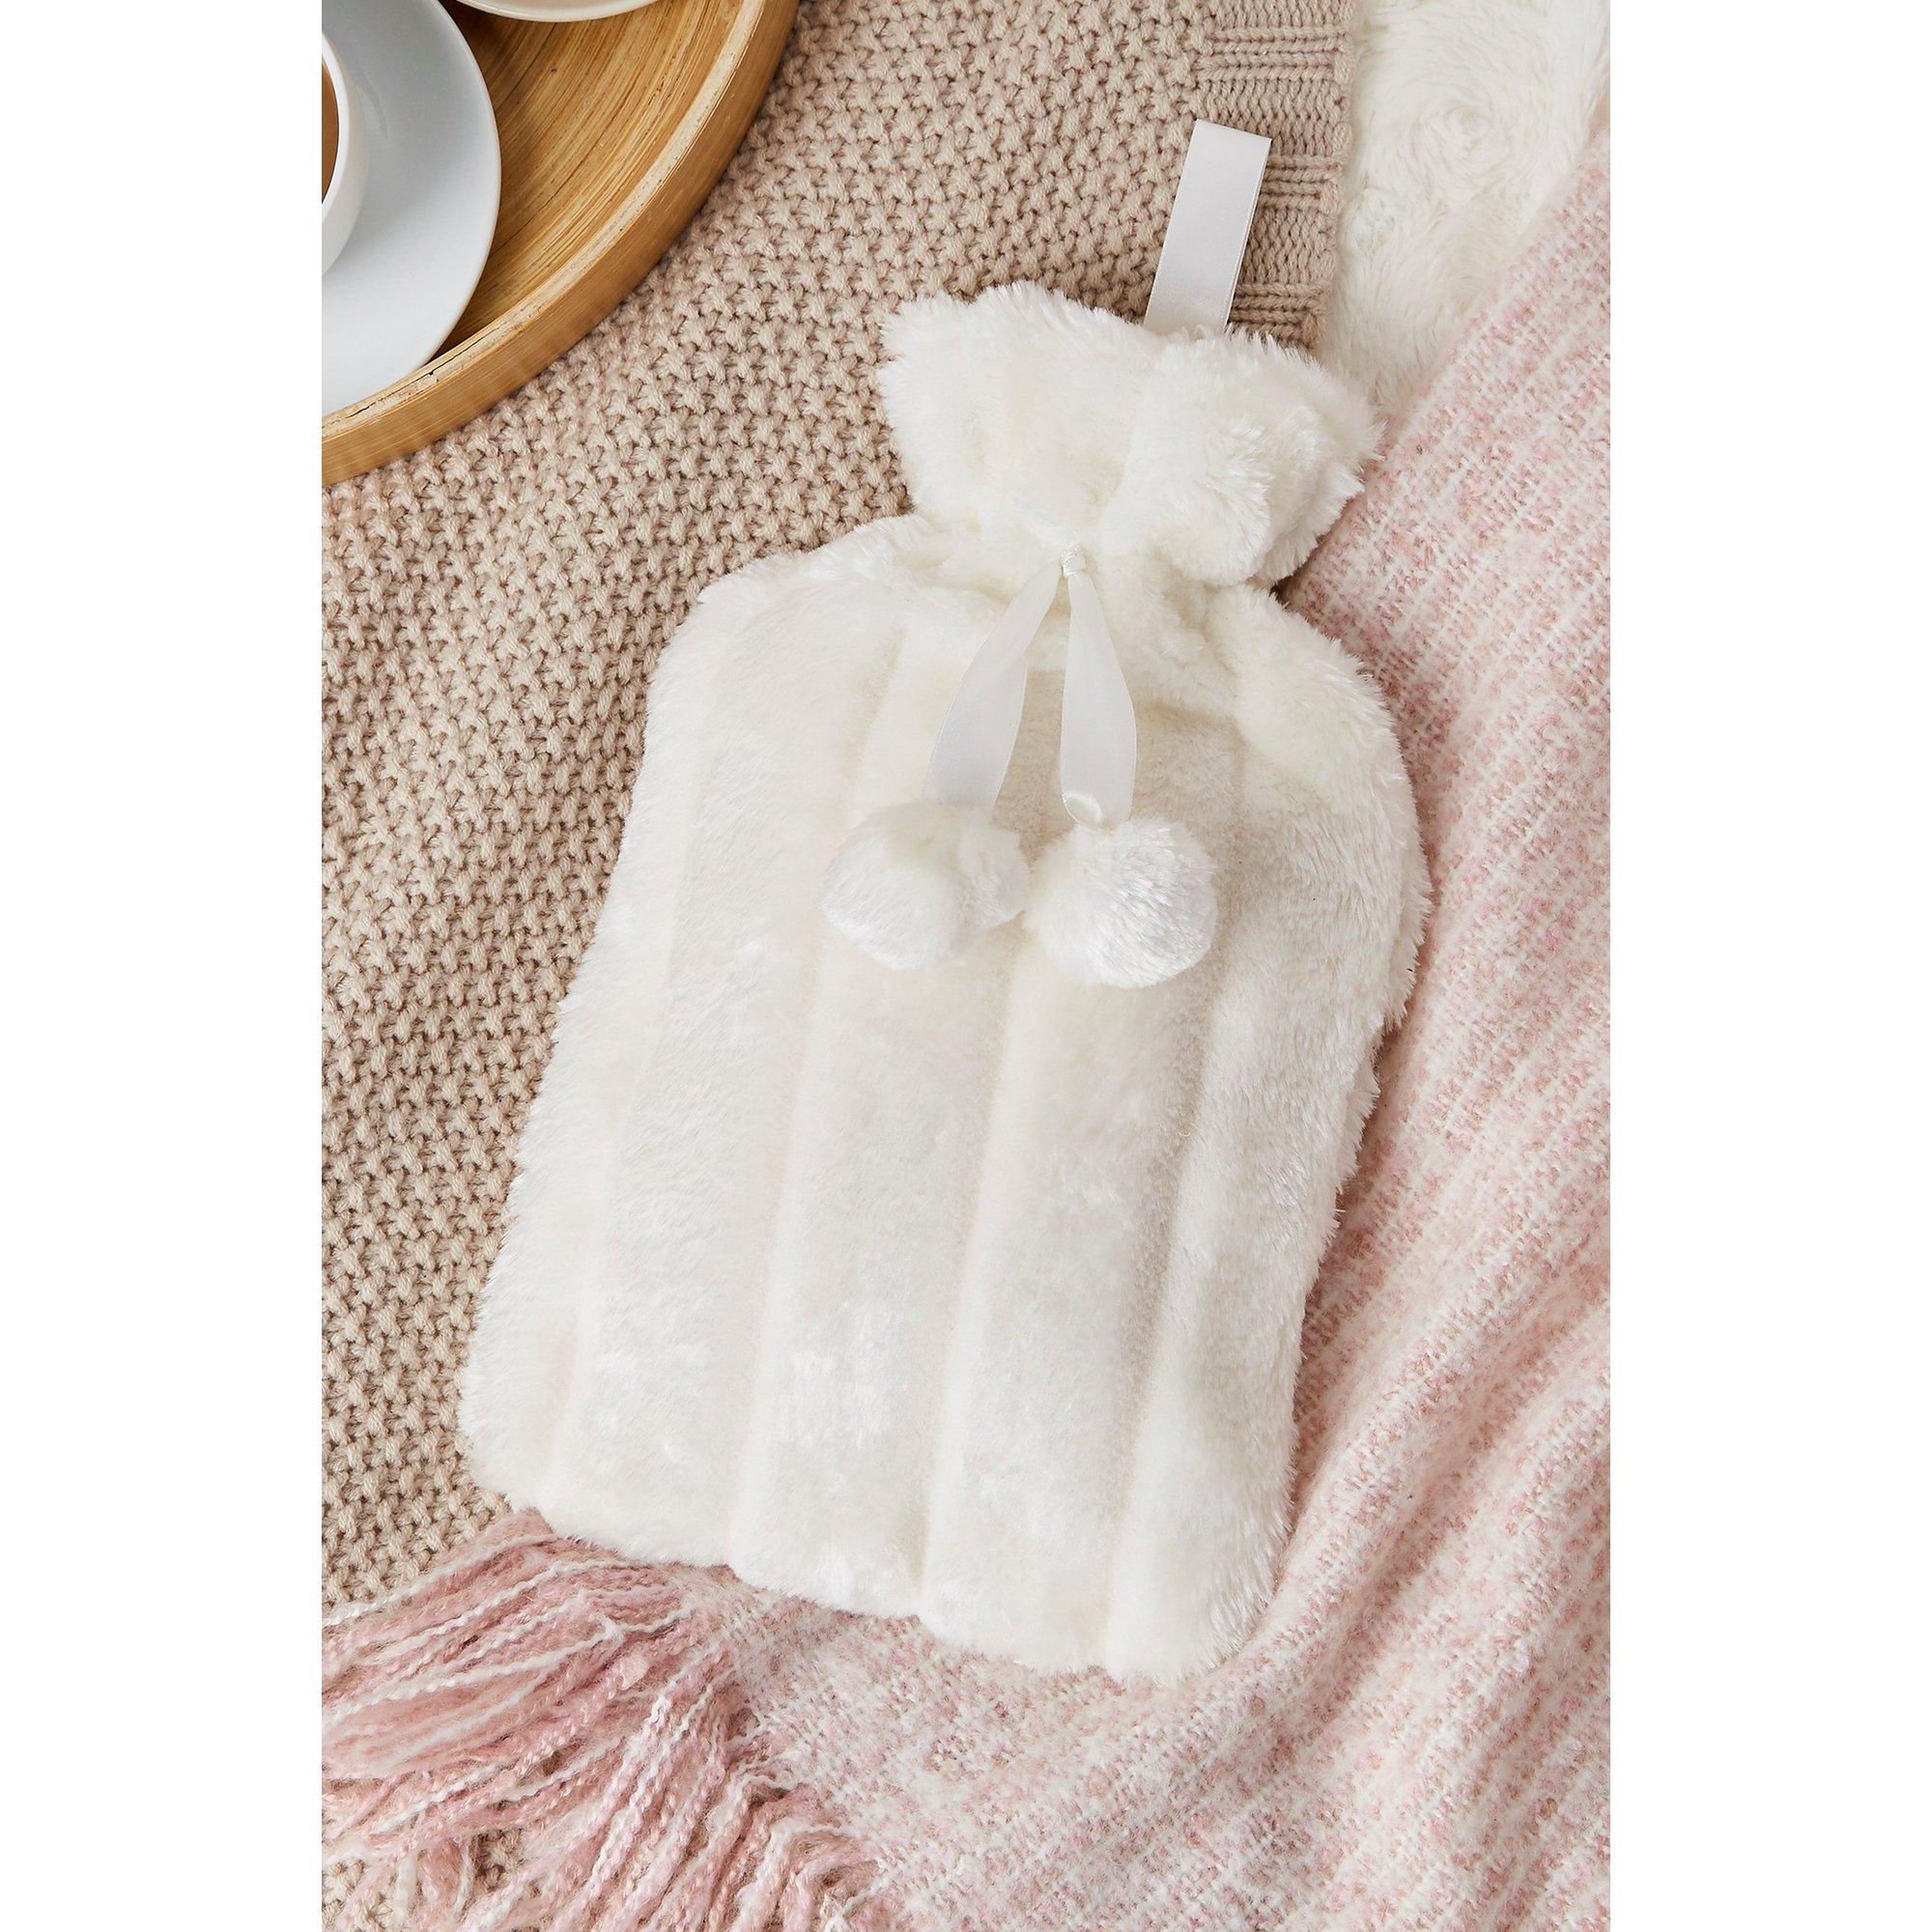 Image of Faux Fur Hot Water Bottle